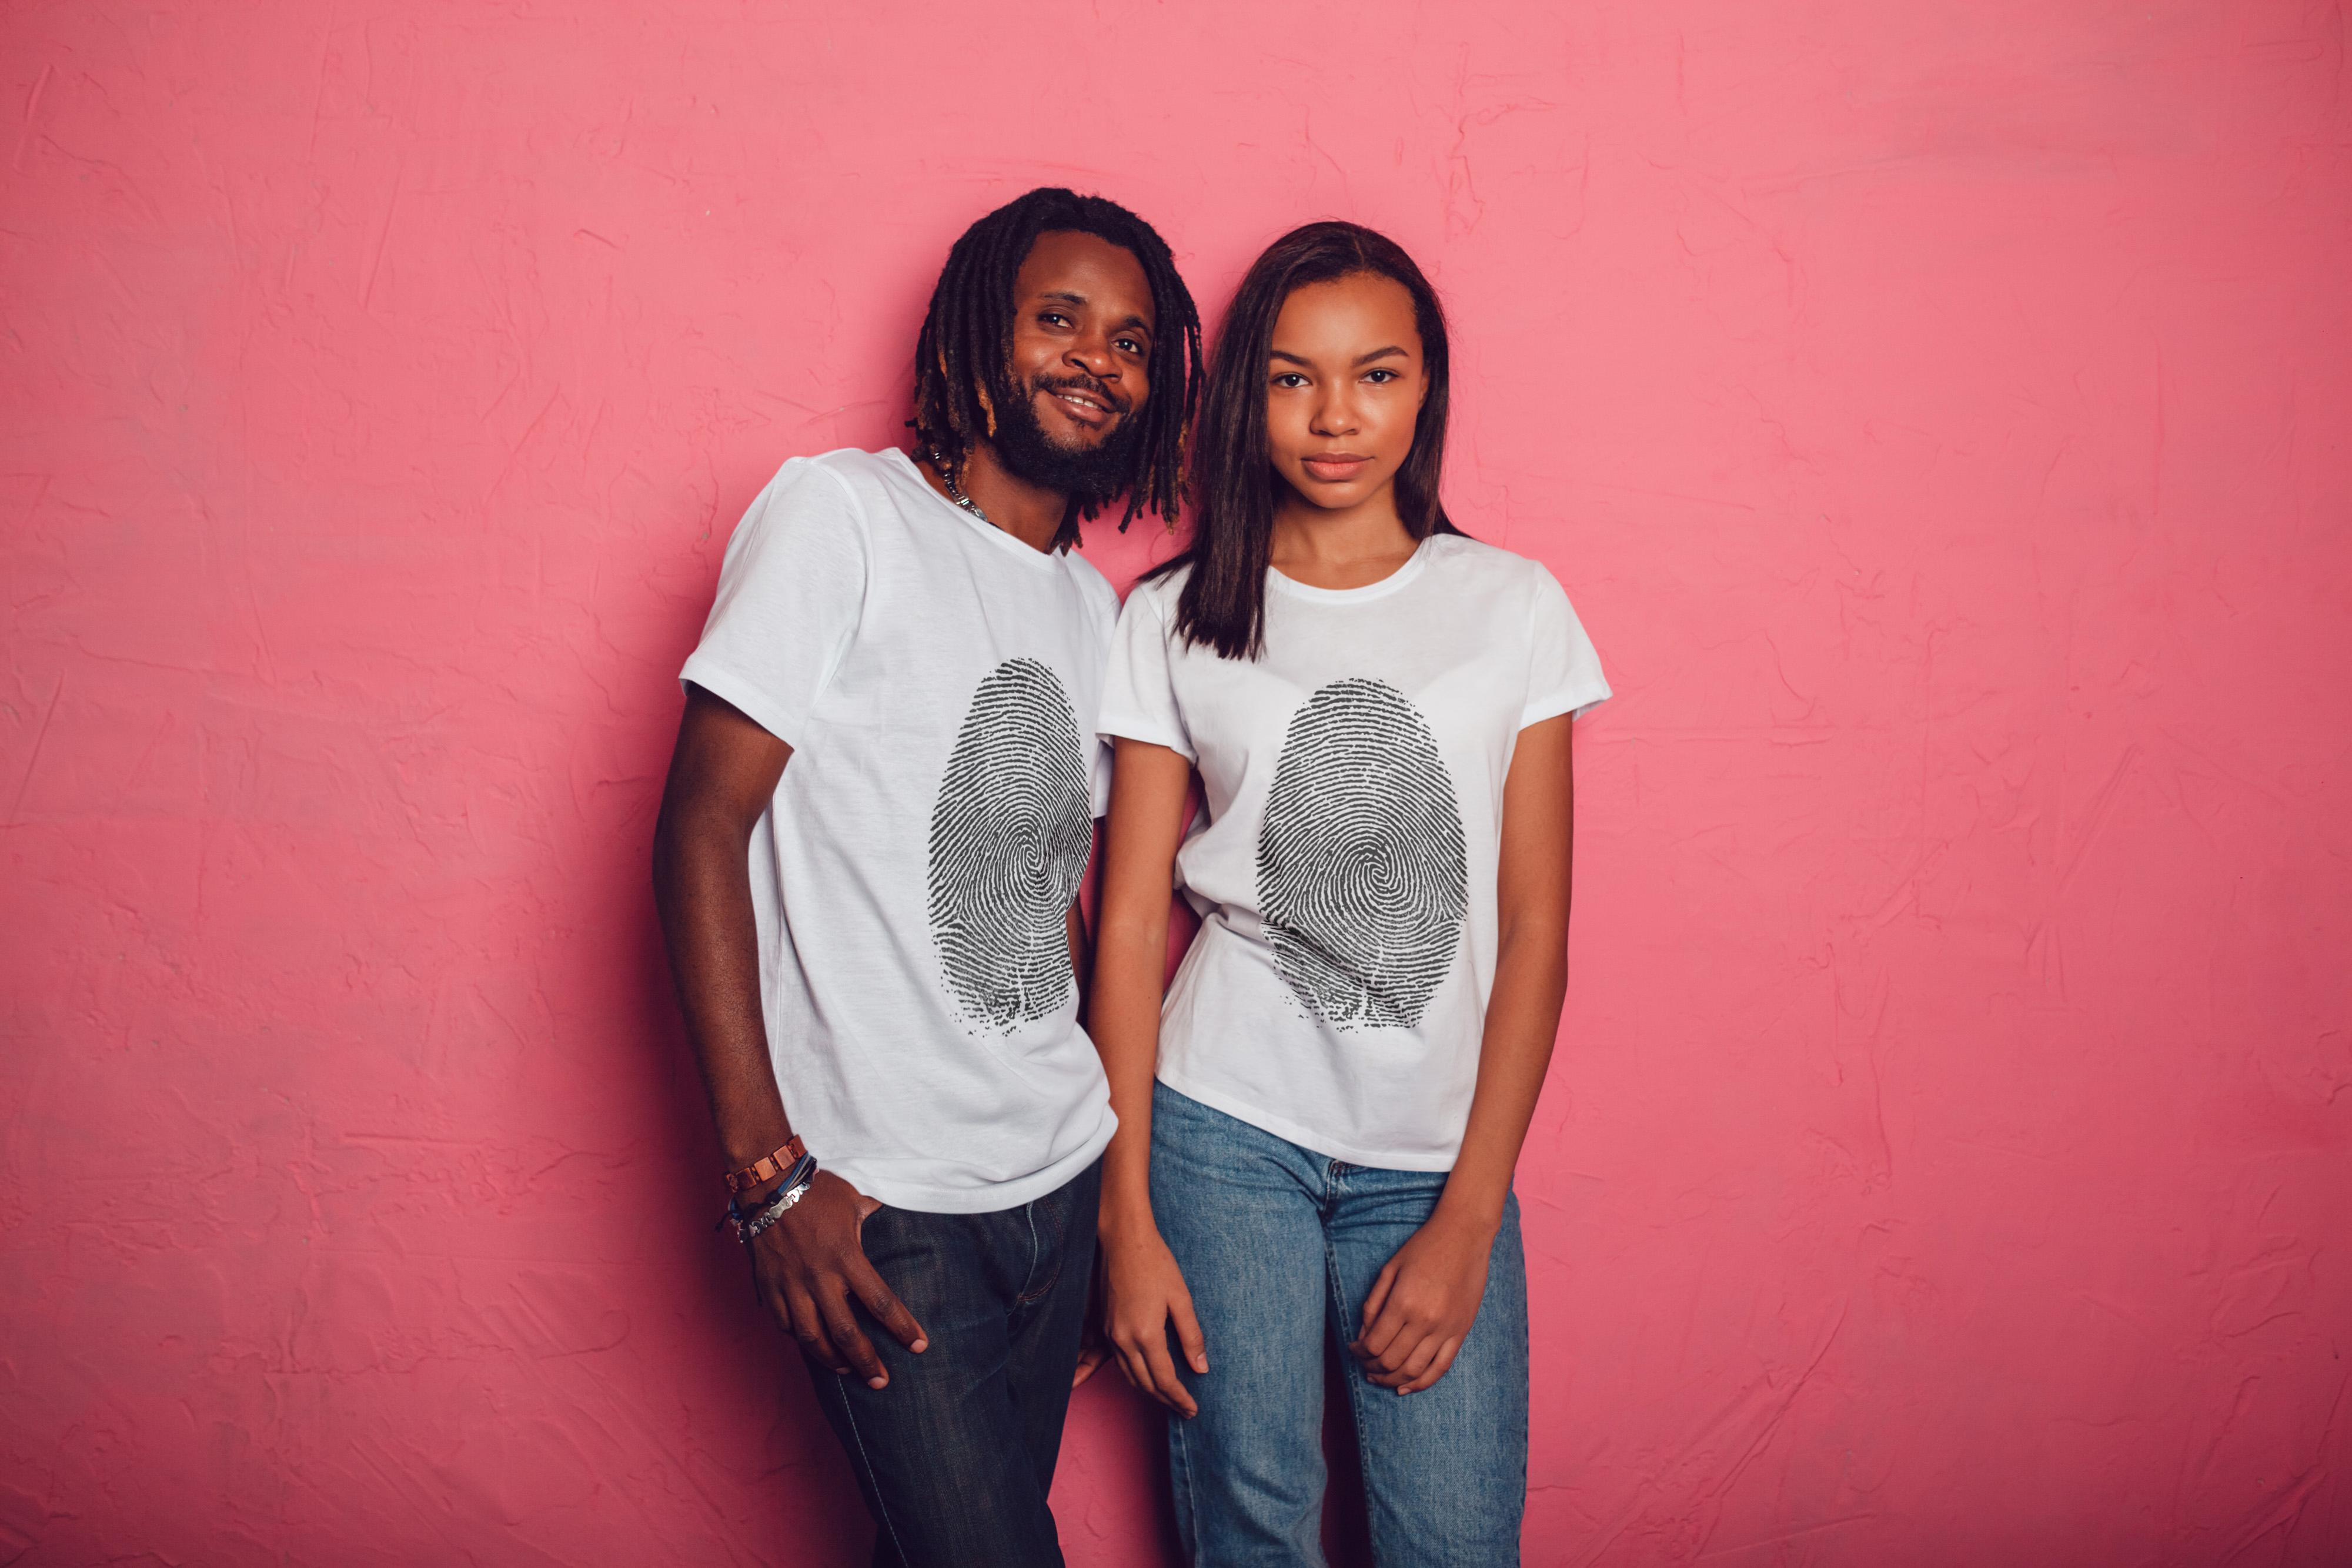 T-Shirt Mock-Up 2018 #1 example image 7